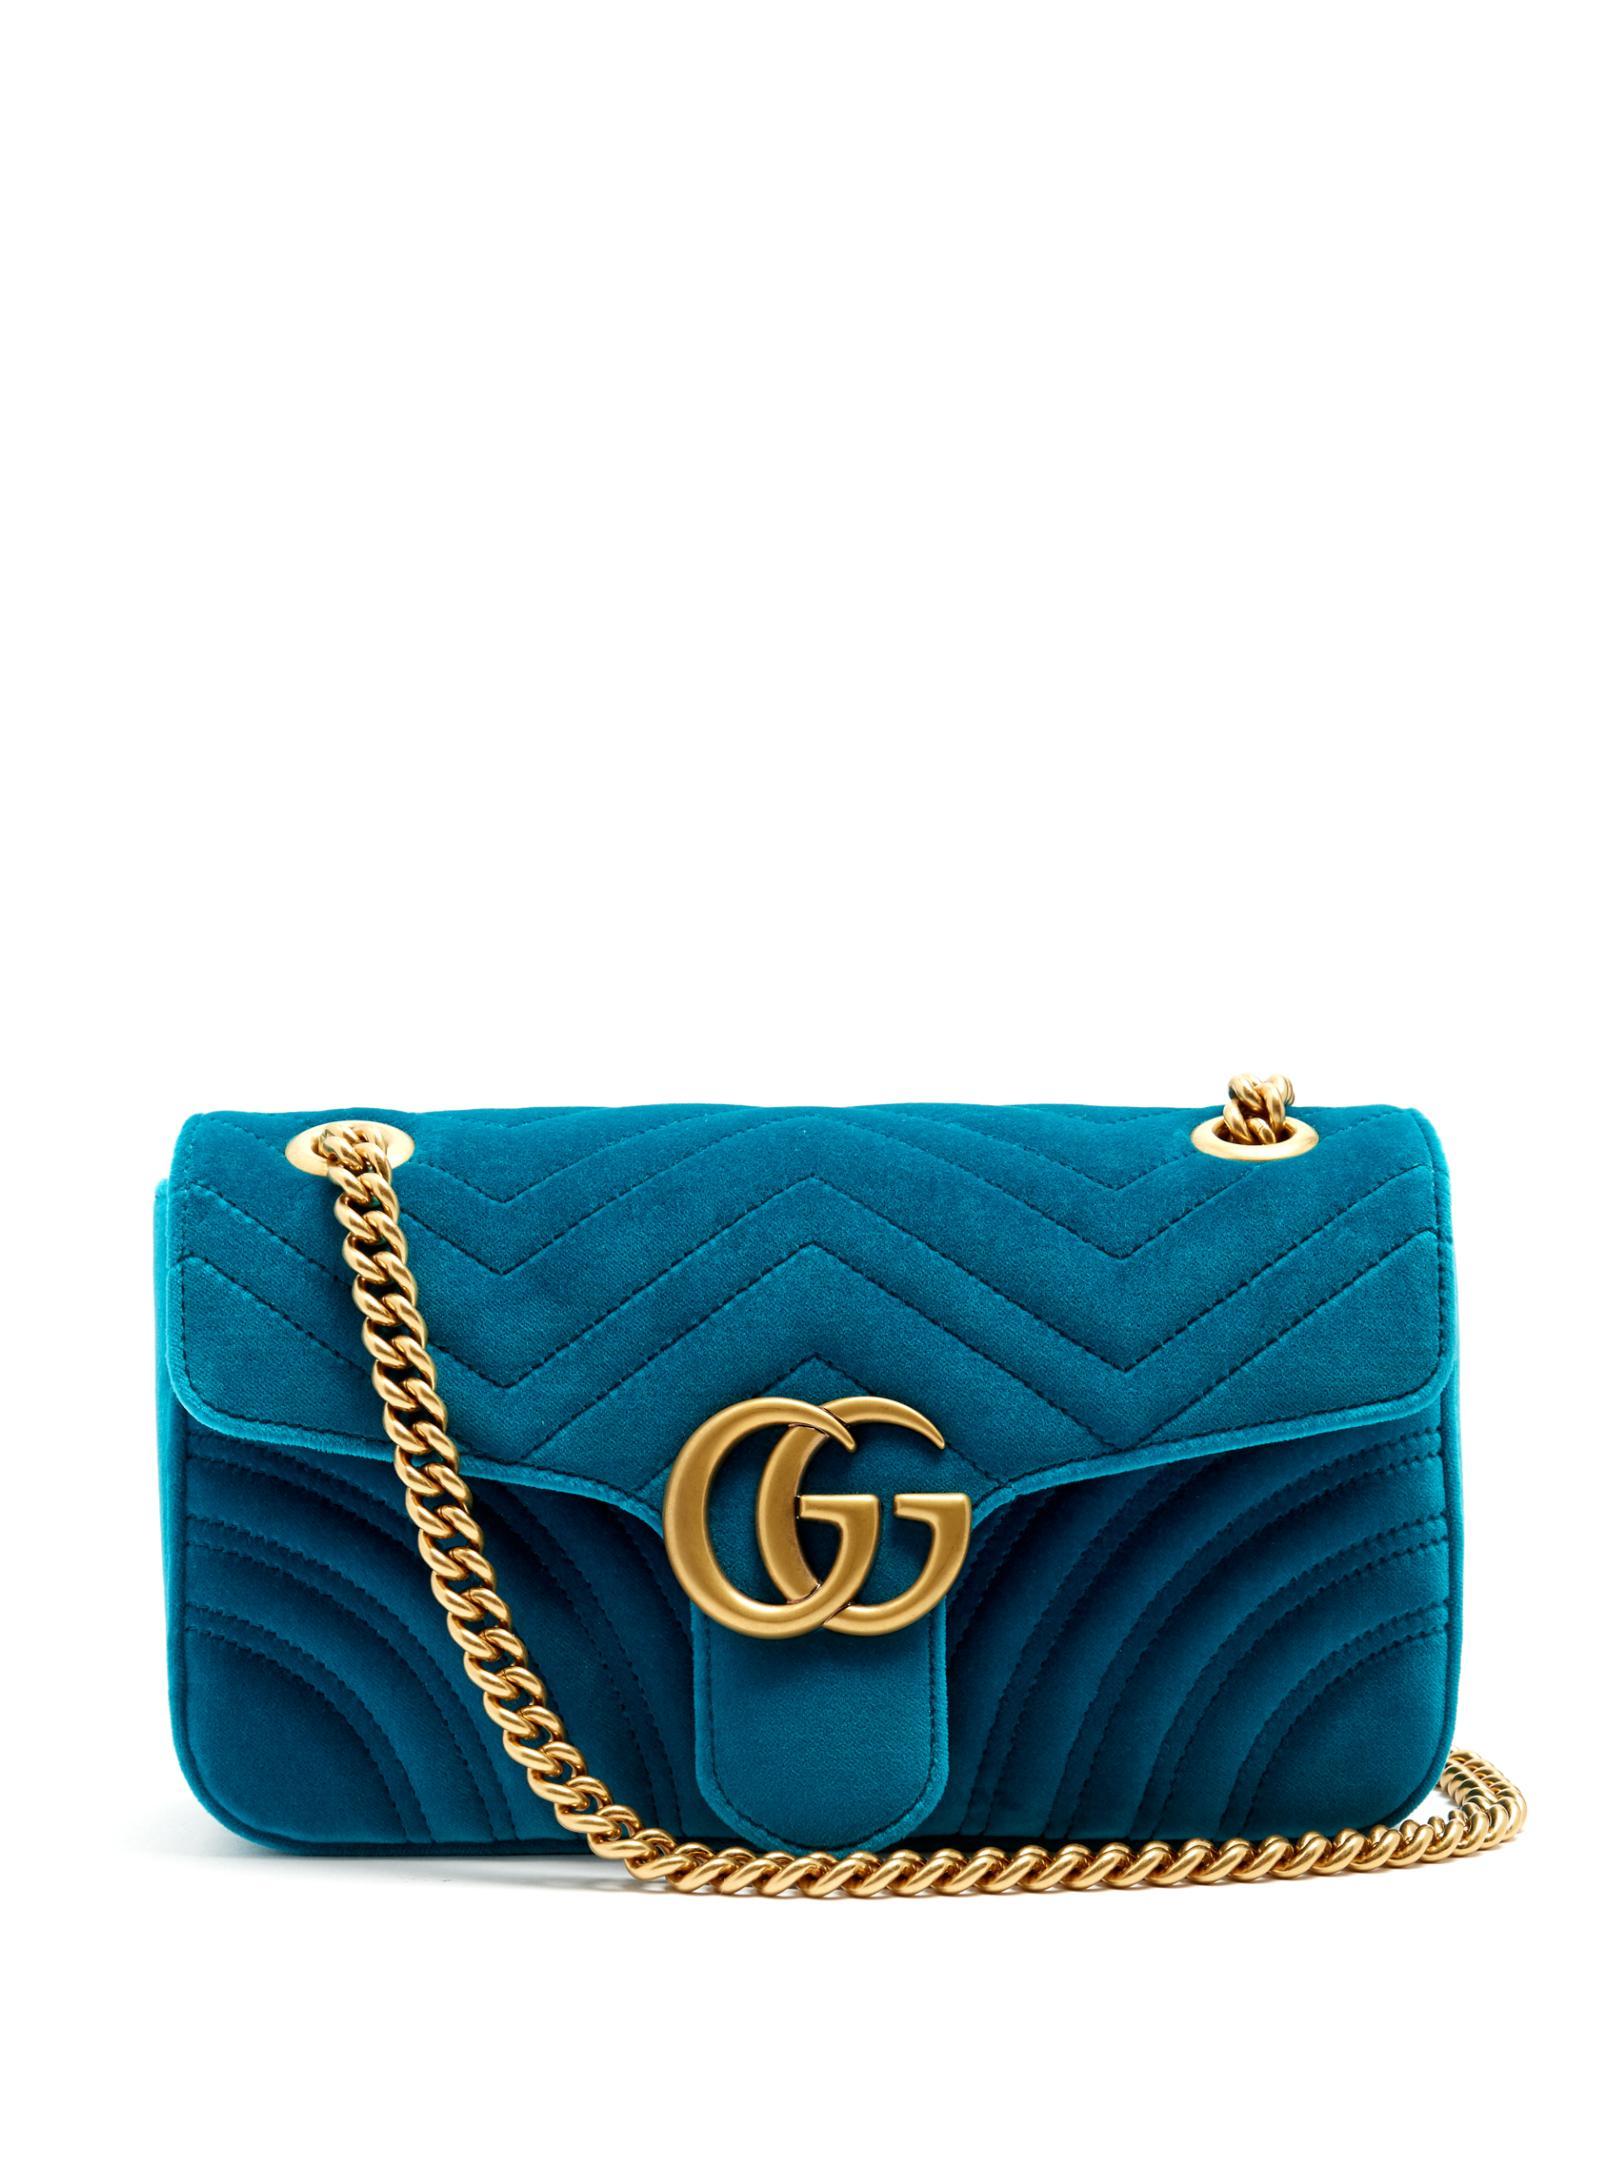 0b1660c60e23a4 Gucci Marmont Bag Small Velvet   Mount Mercy University